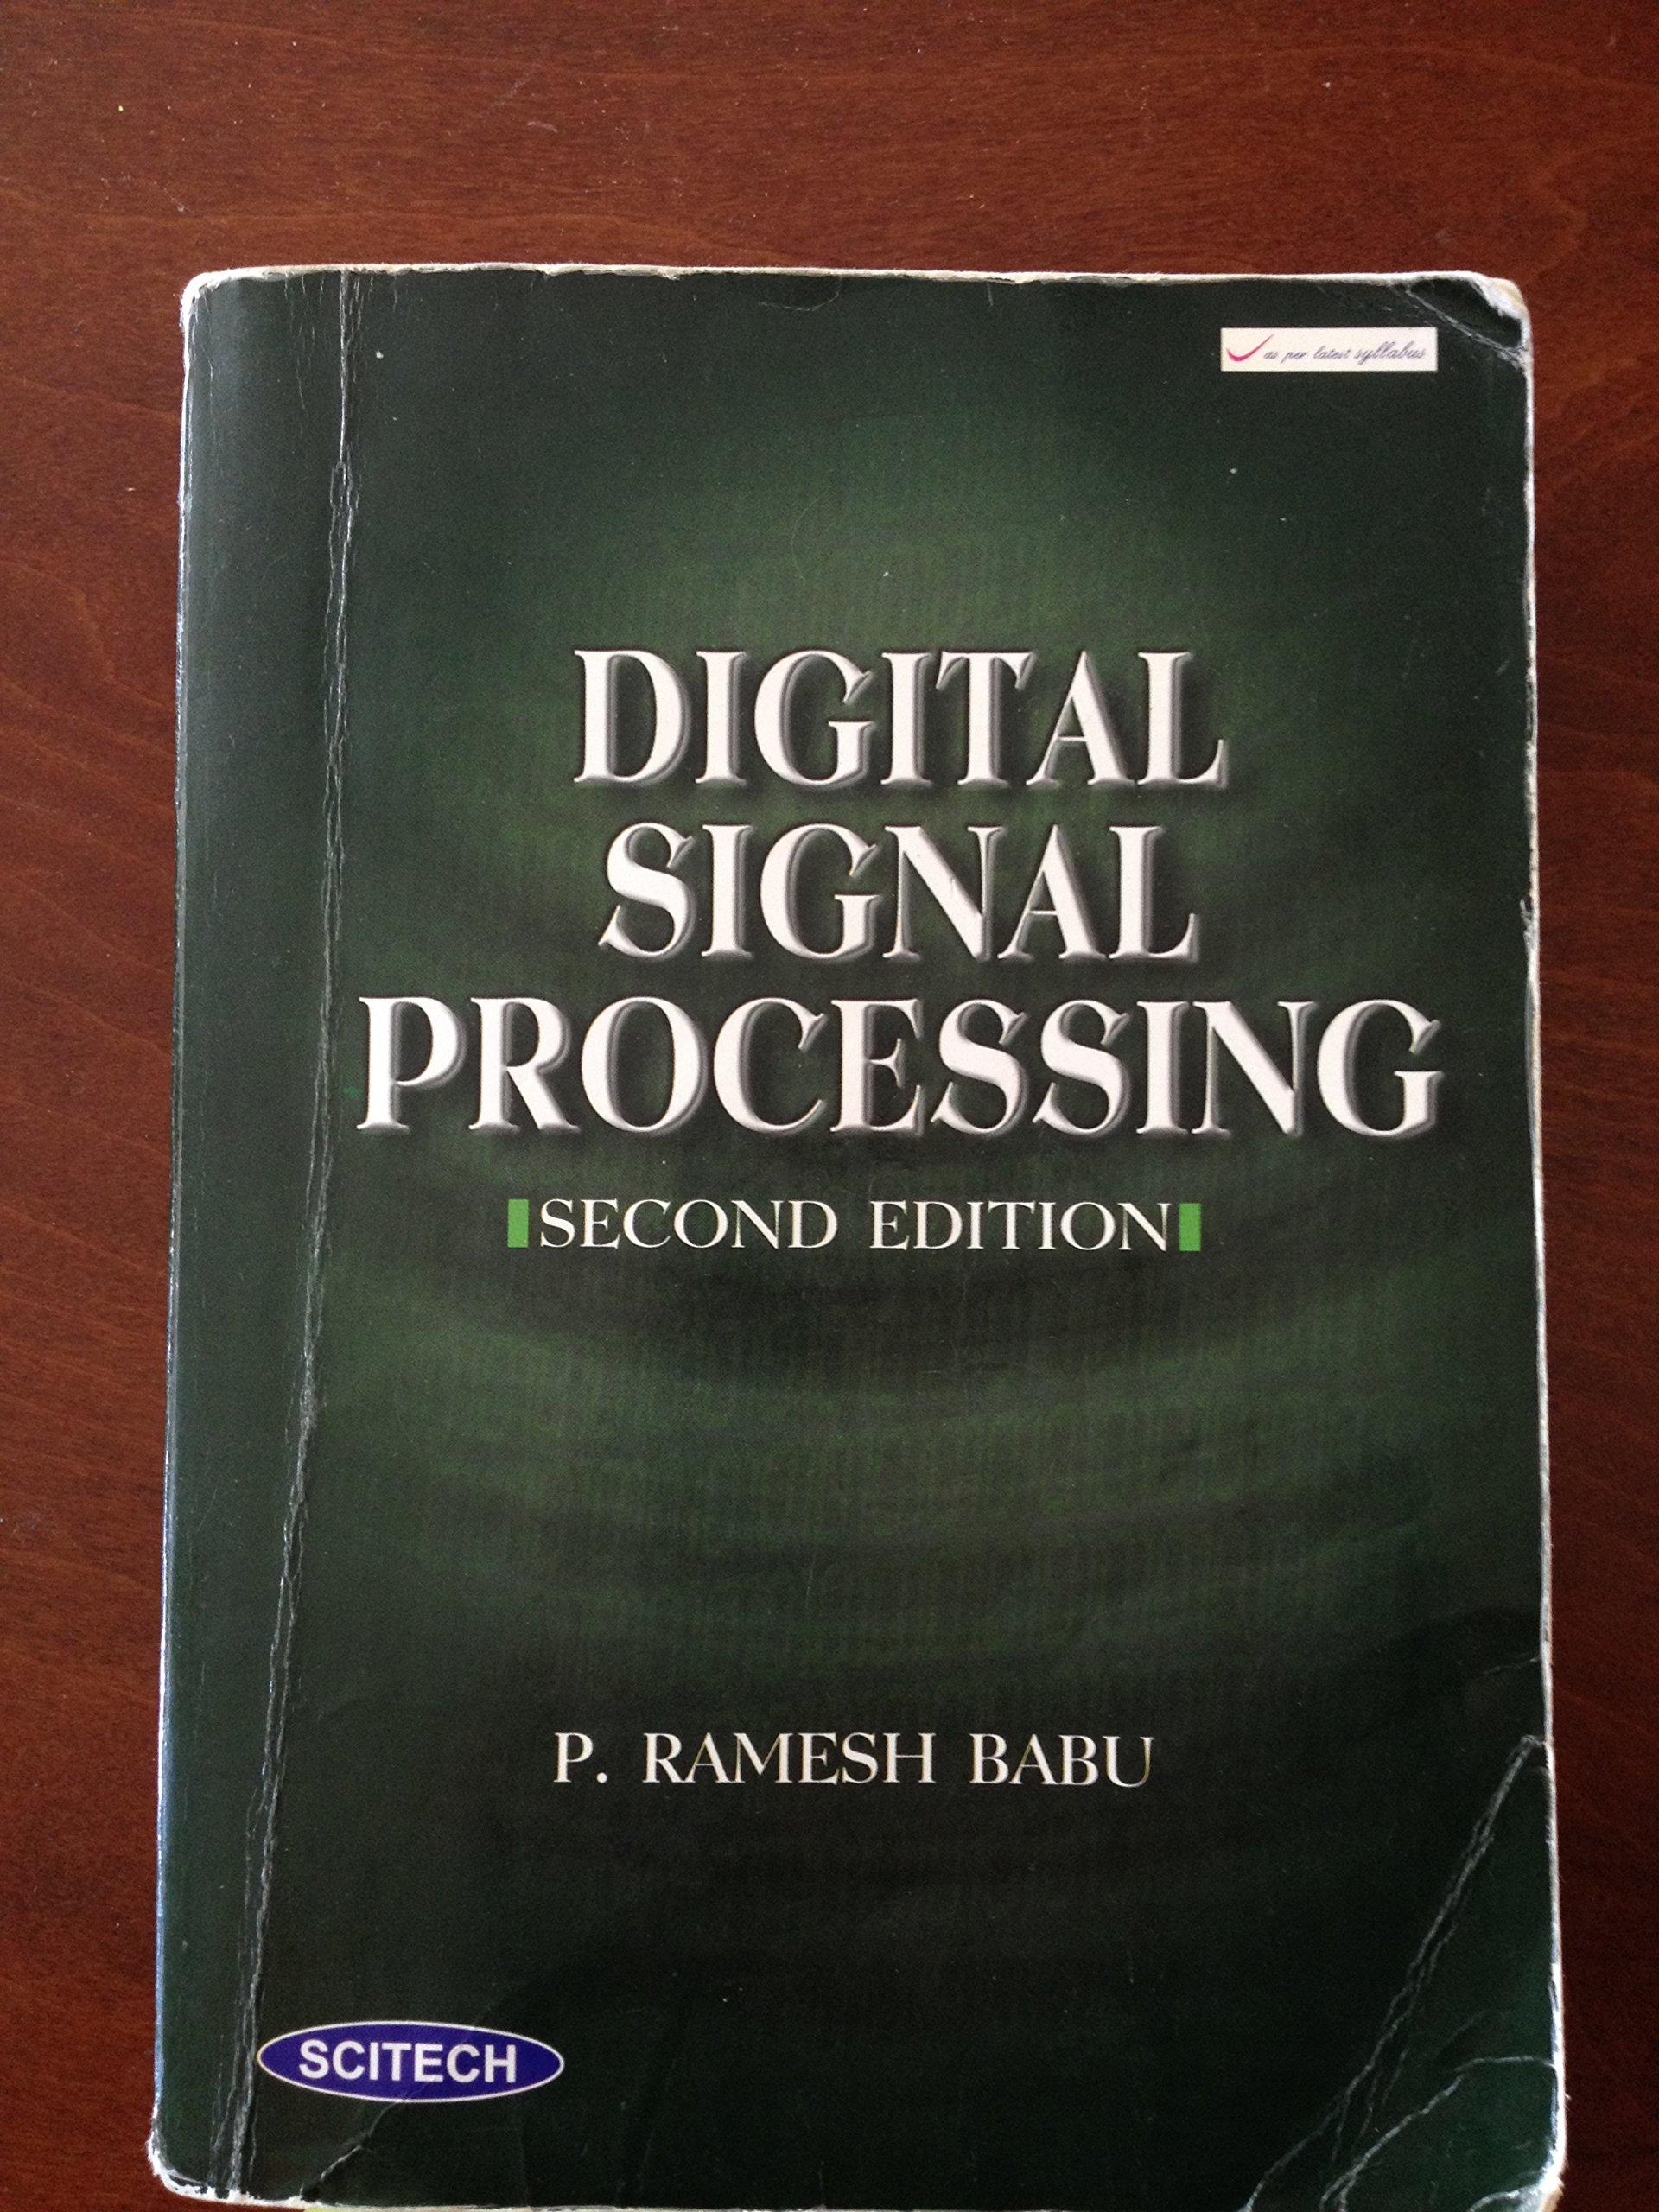 free dsp ramesh babu e-books